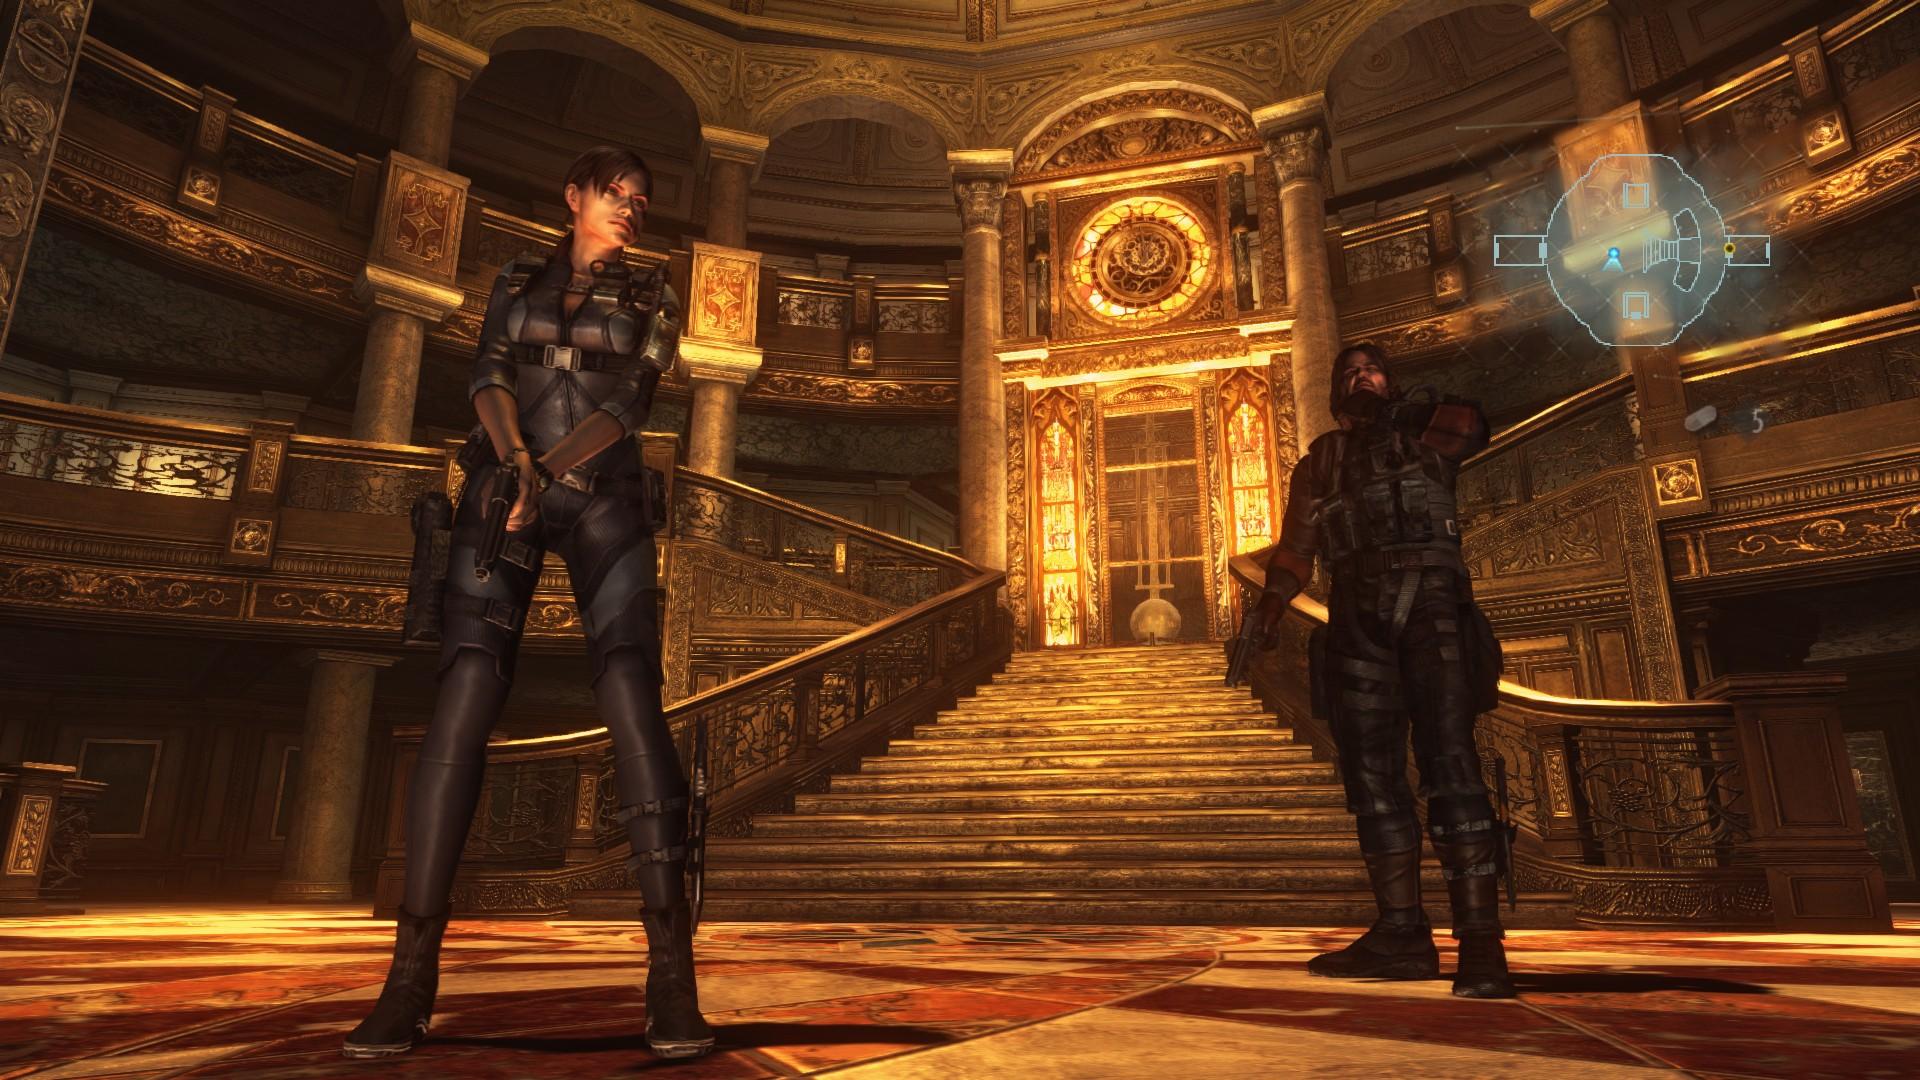 Hall | Resident Evil Wiki | Fandom